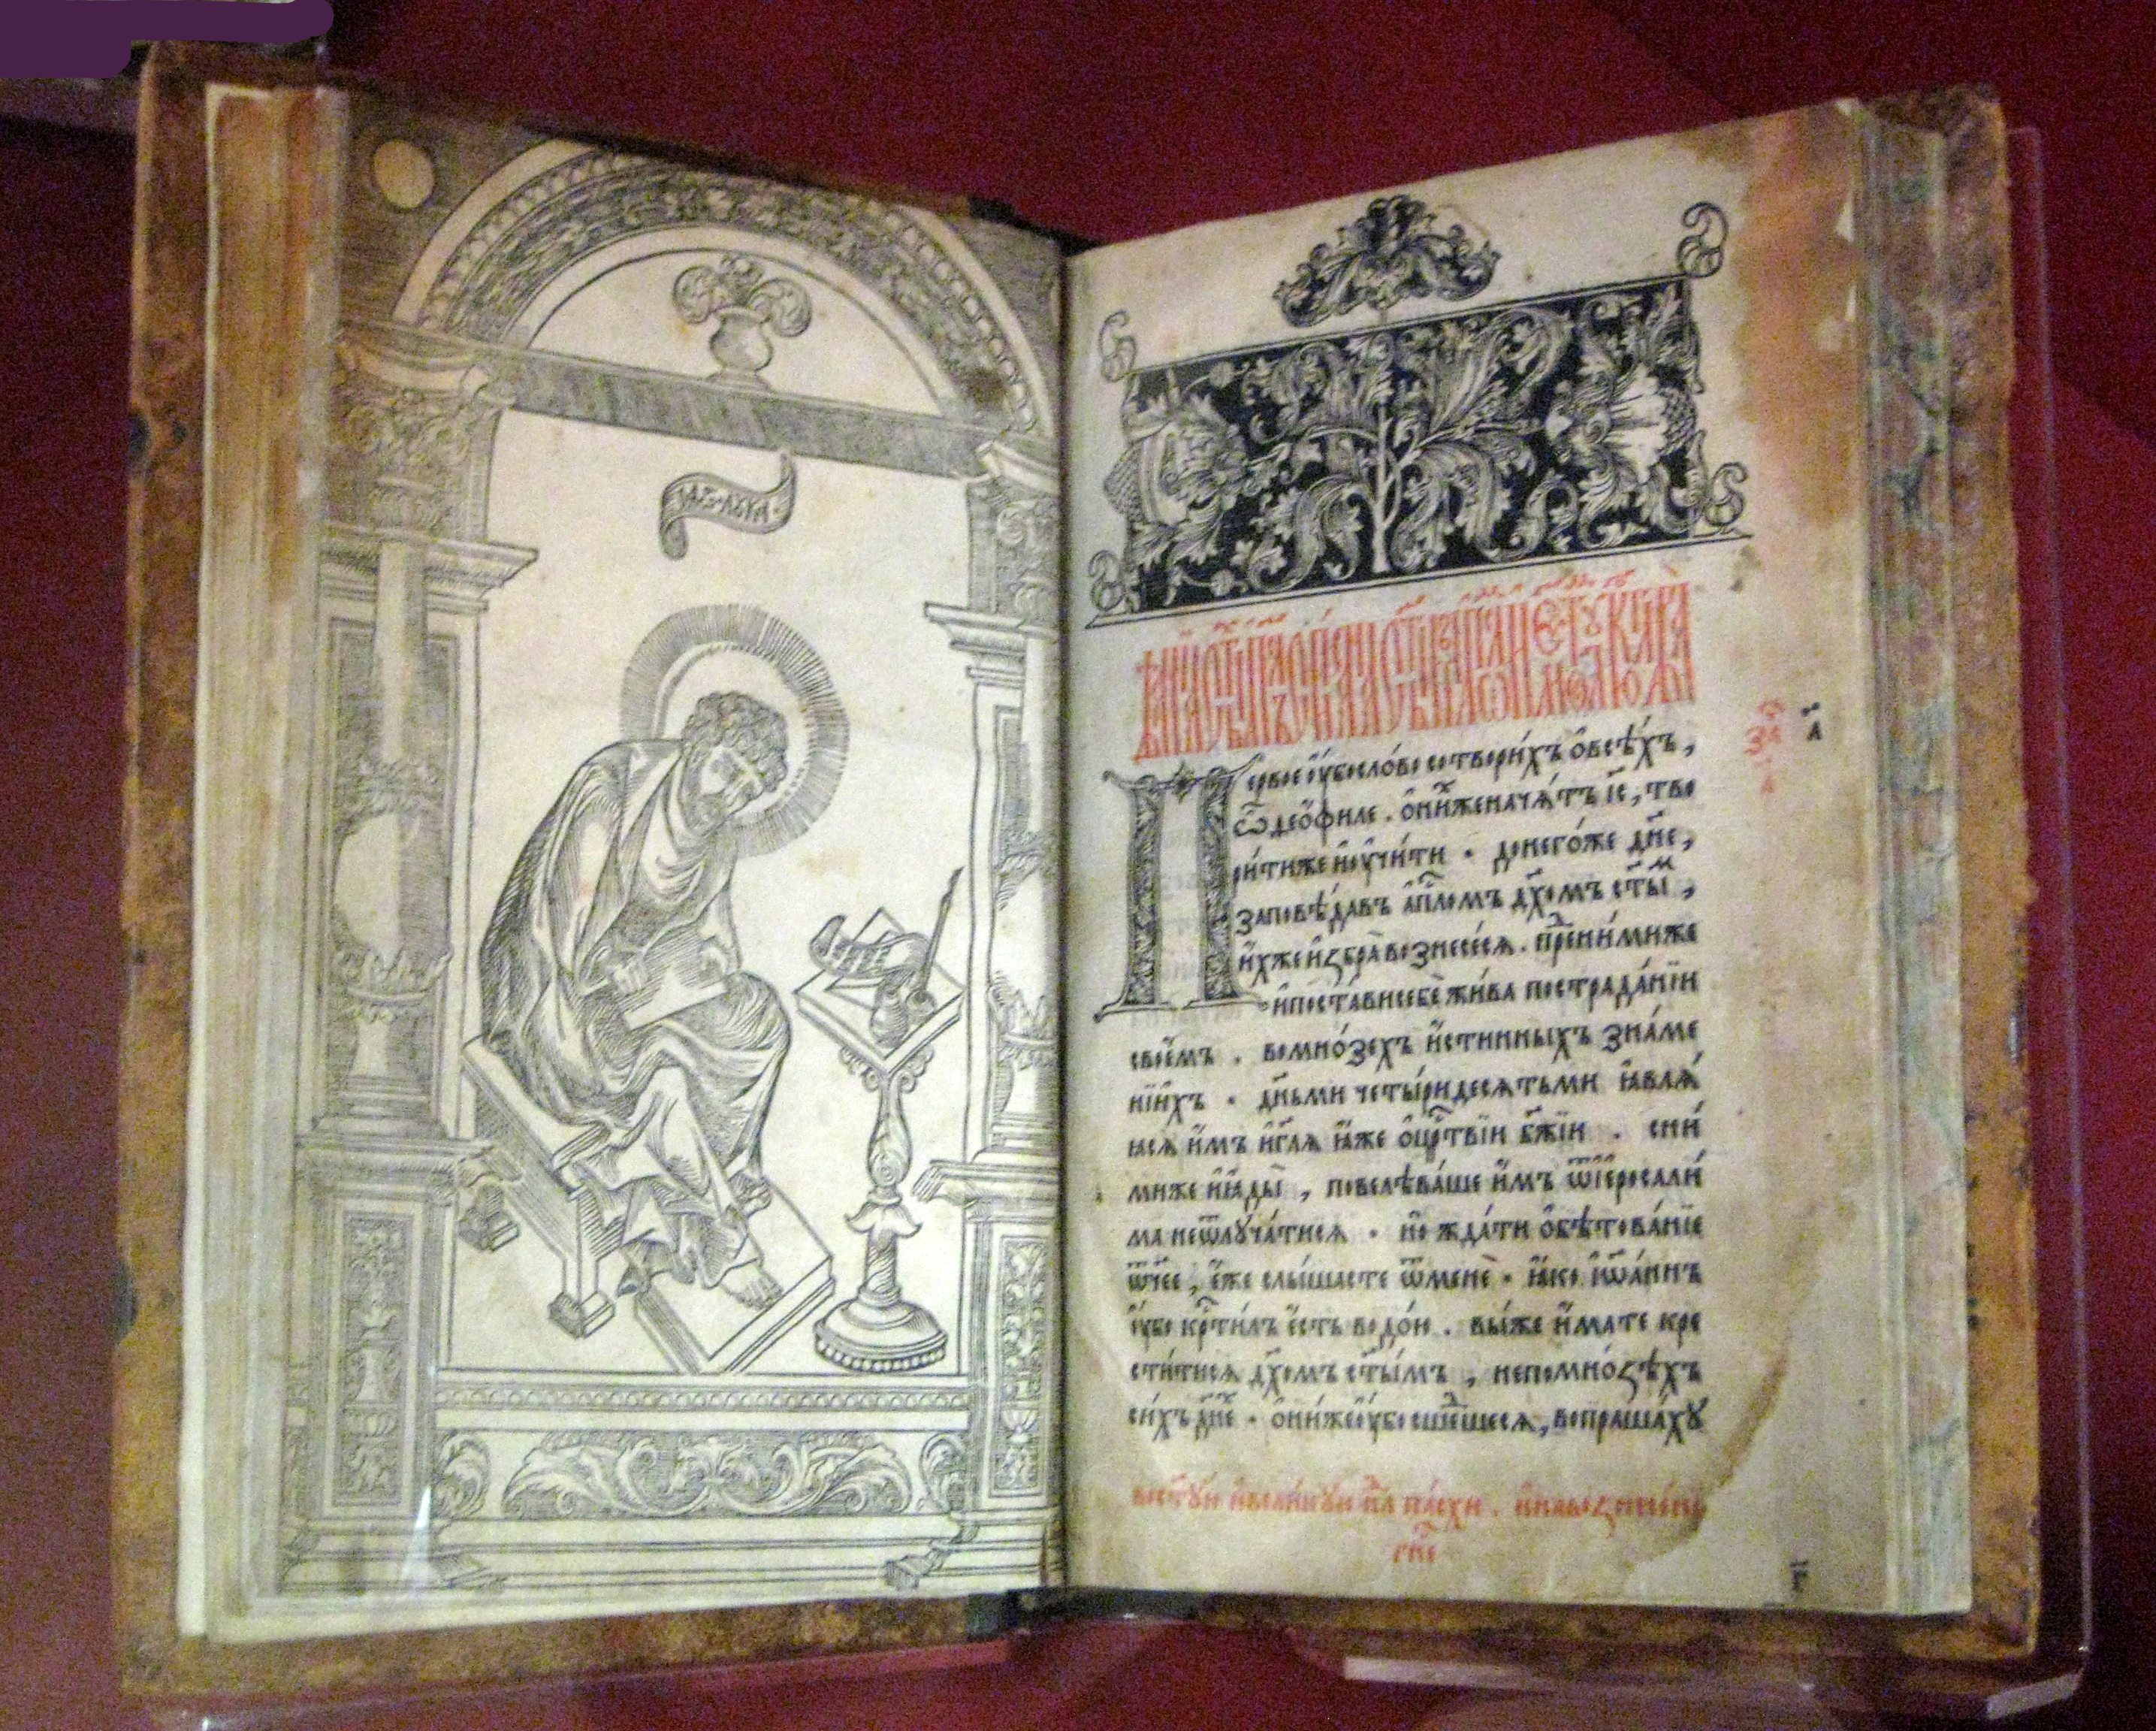 File:Apostol (Ivan Fedorov, 1564).jpg